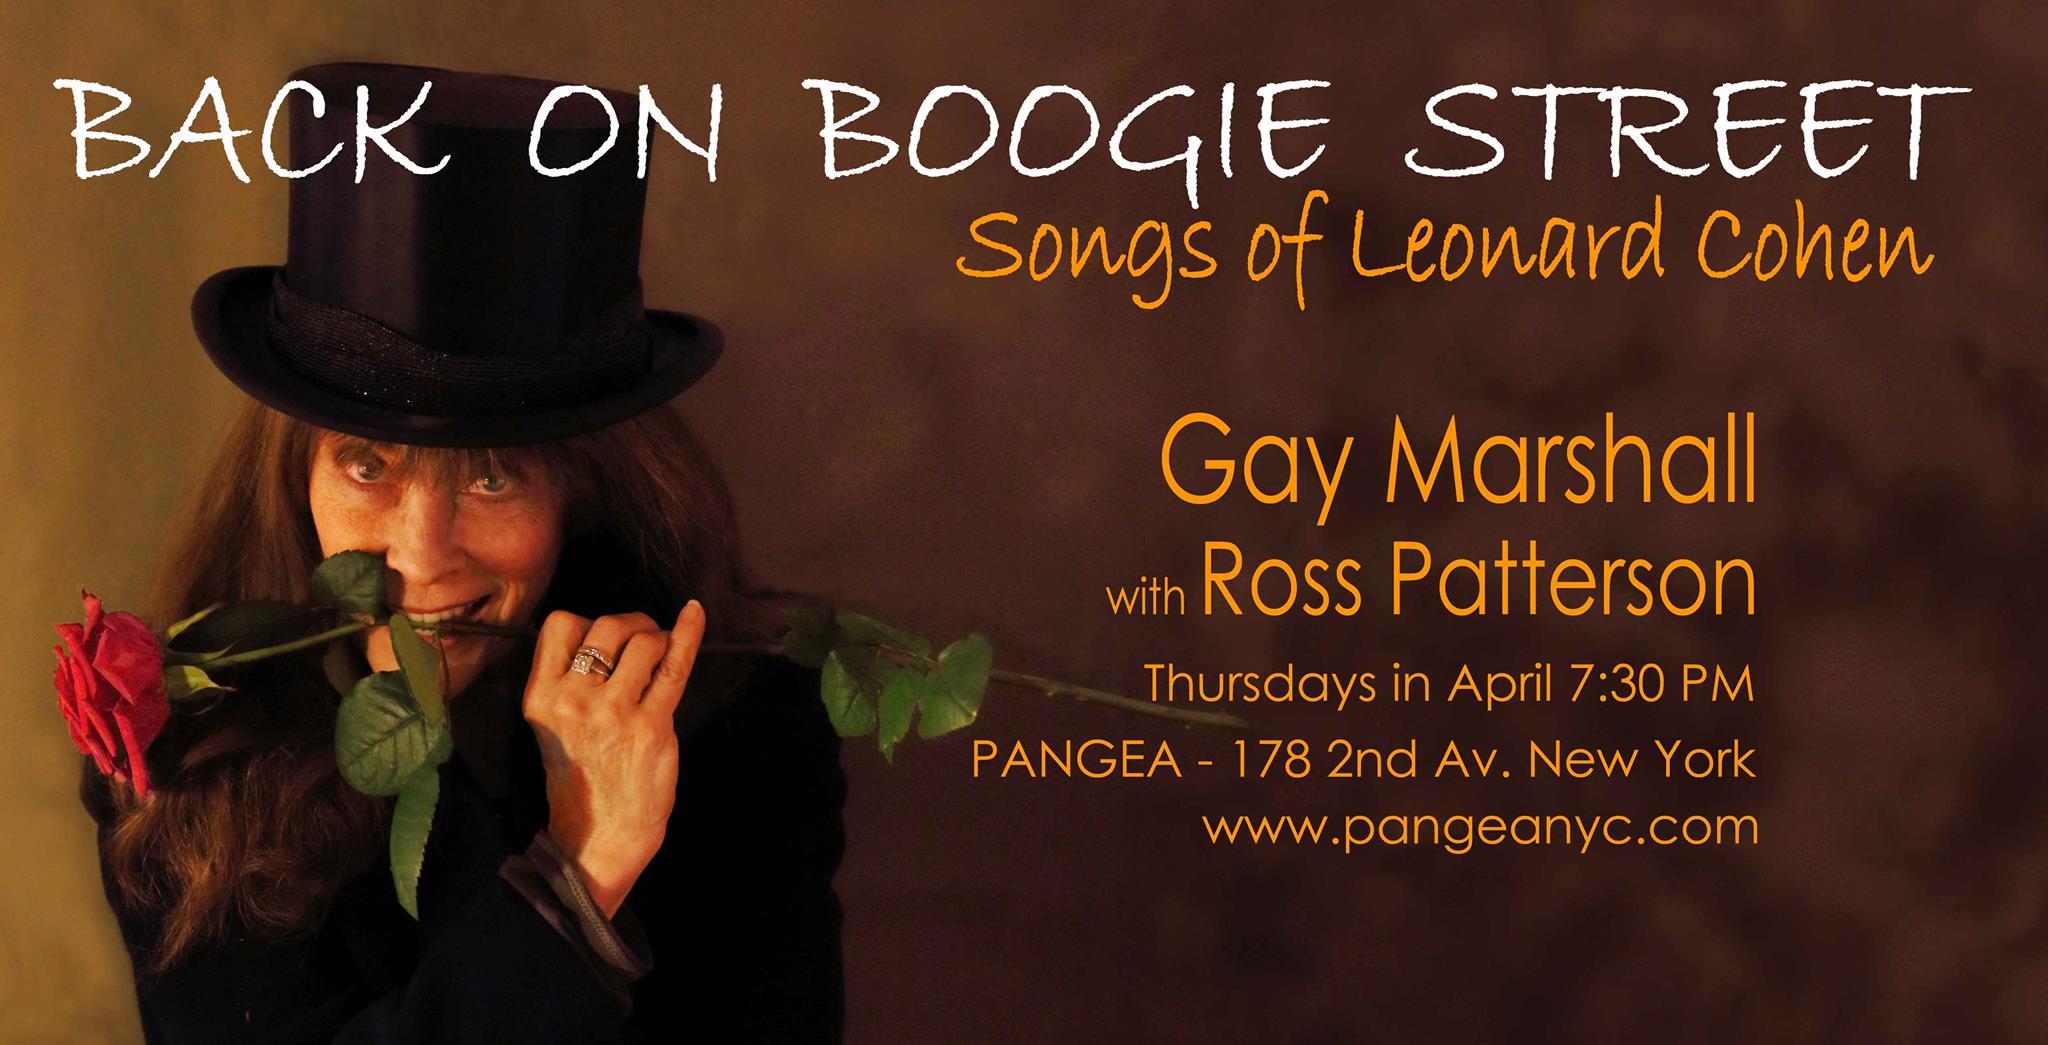 Gay Marshall Back on Boogie Street horizontal poster.jpg